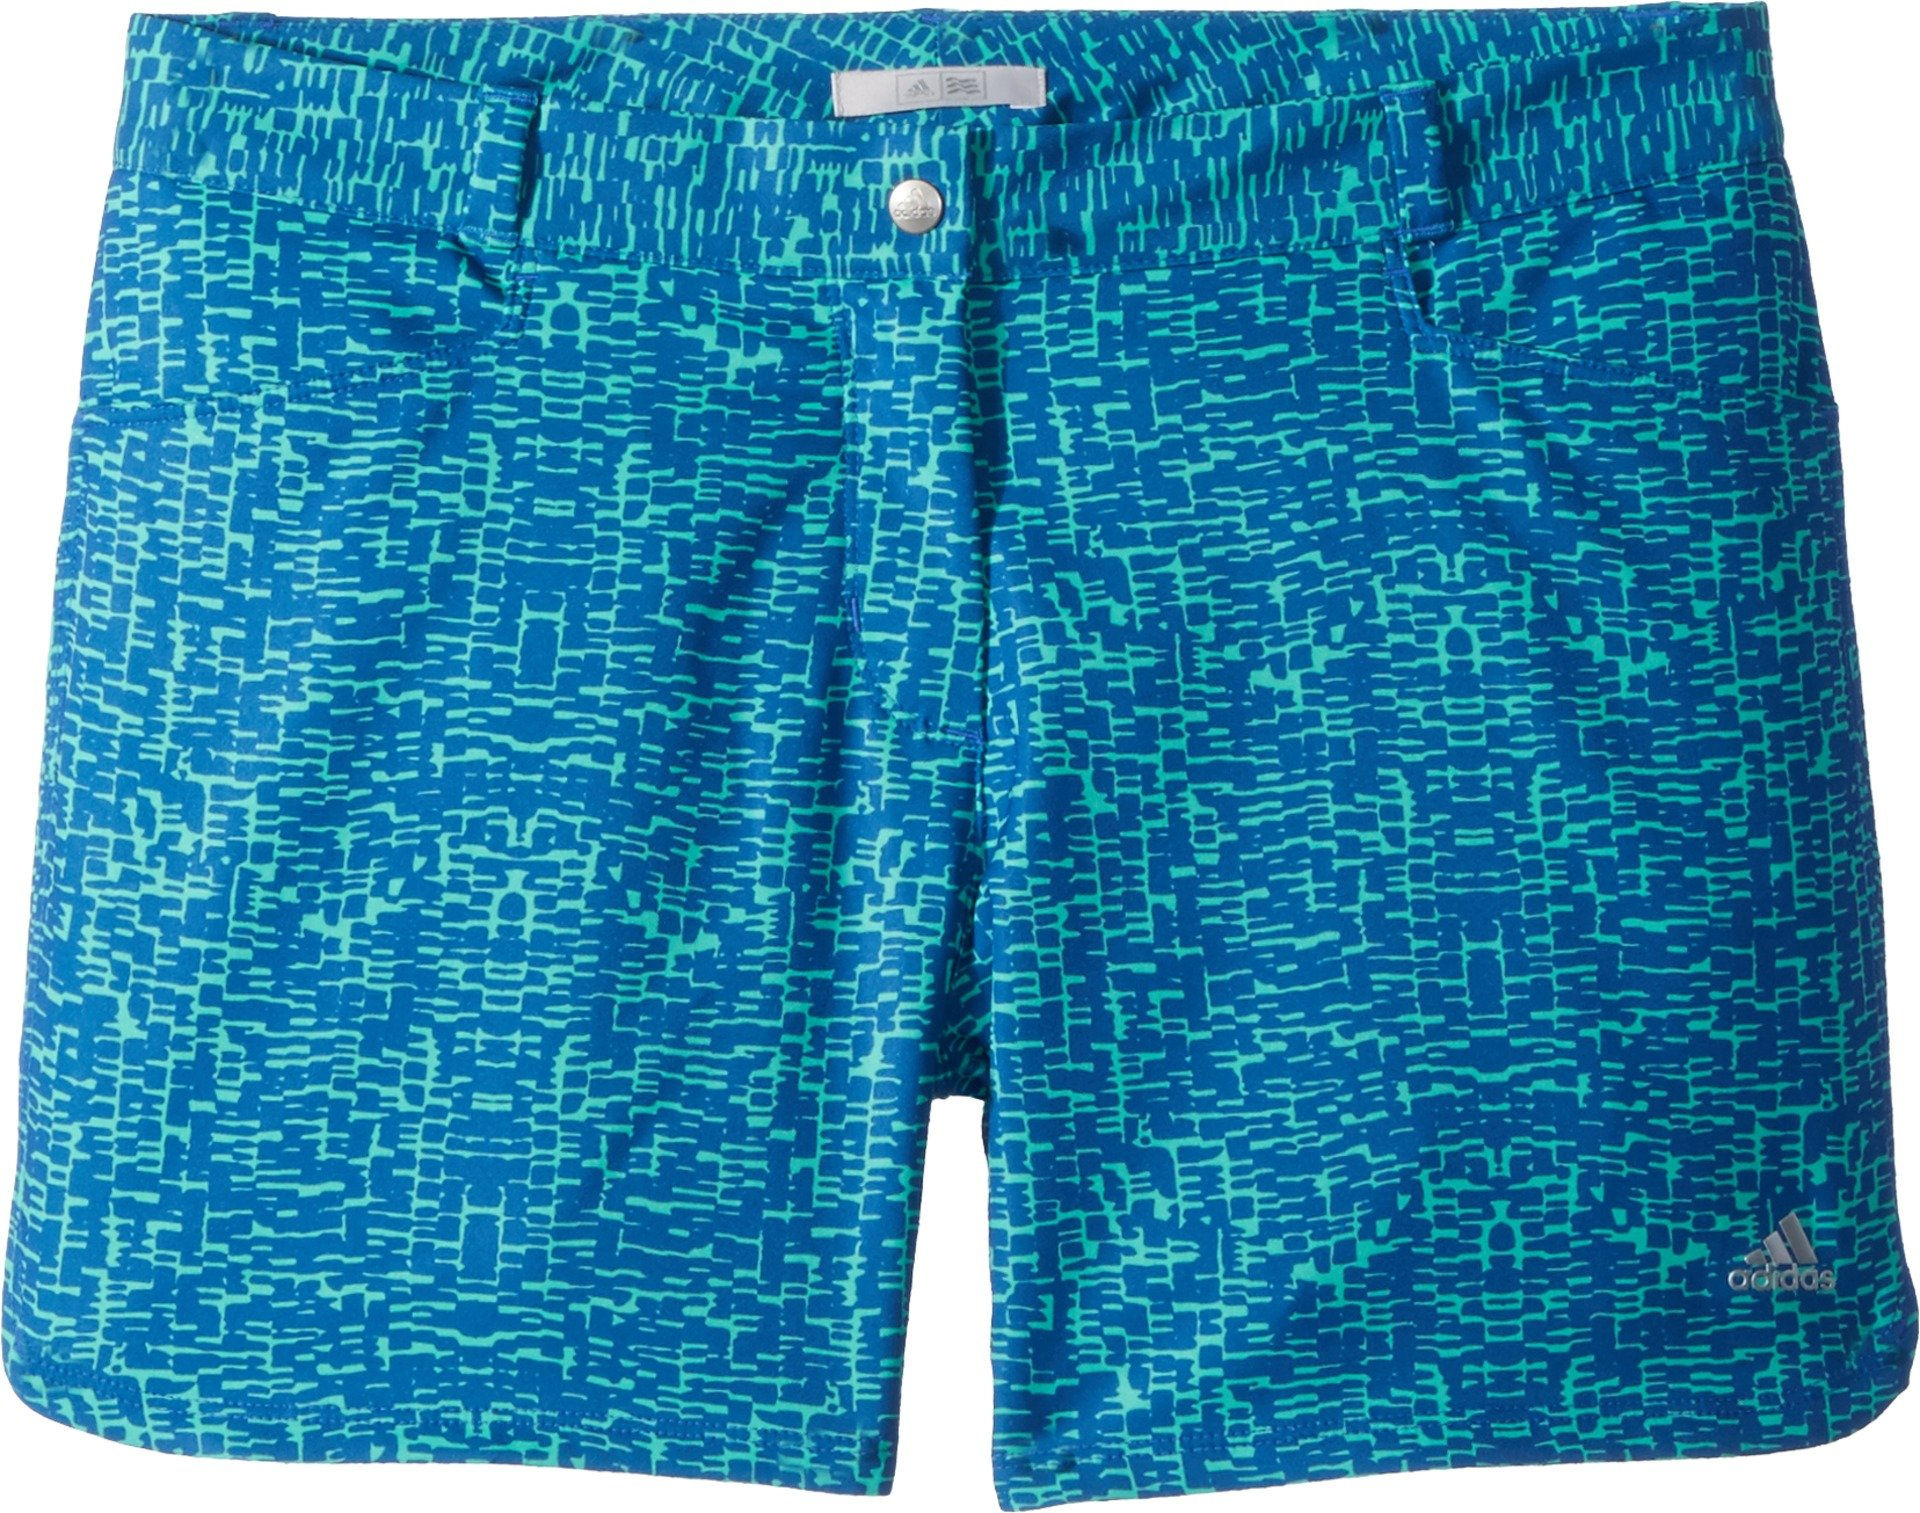 adidas Golf Print Shorts, Hi-Res Blue, X-Large by adidas